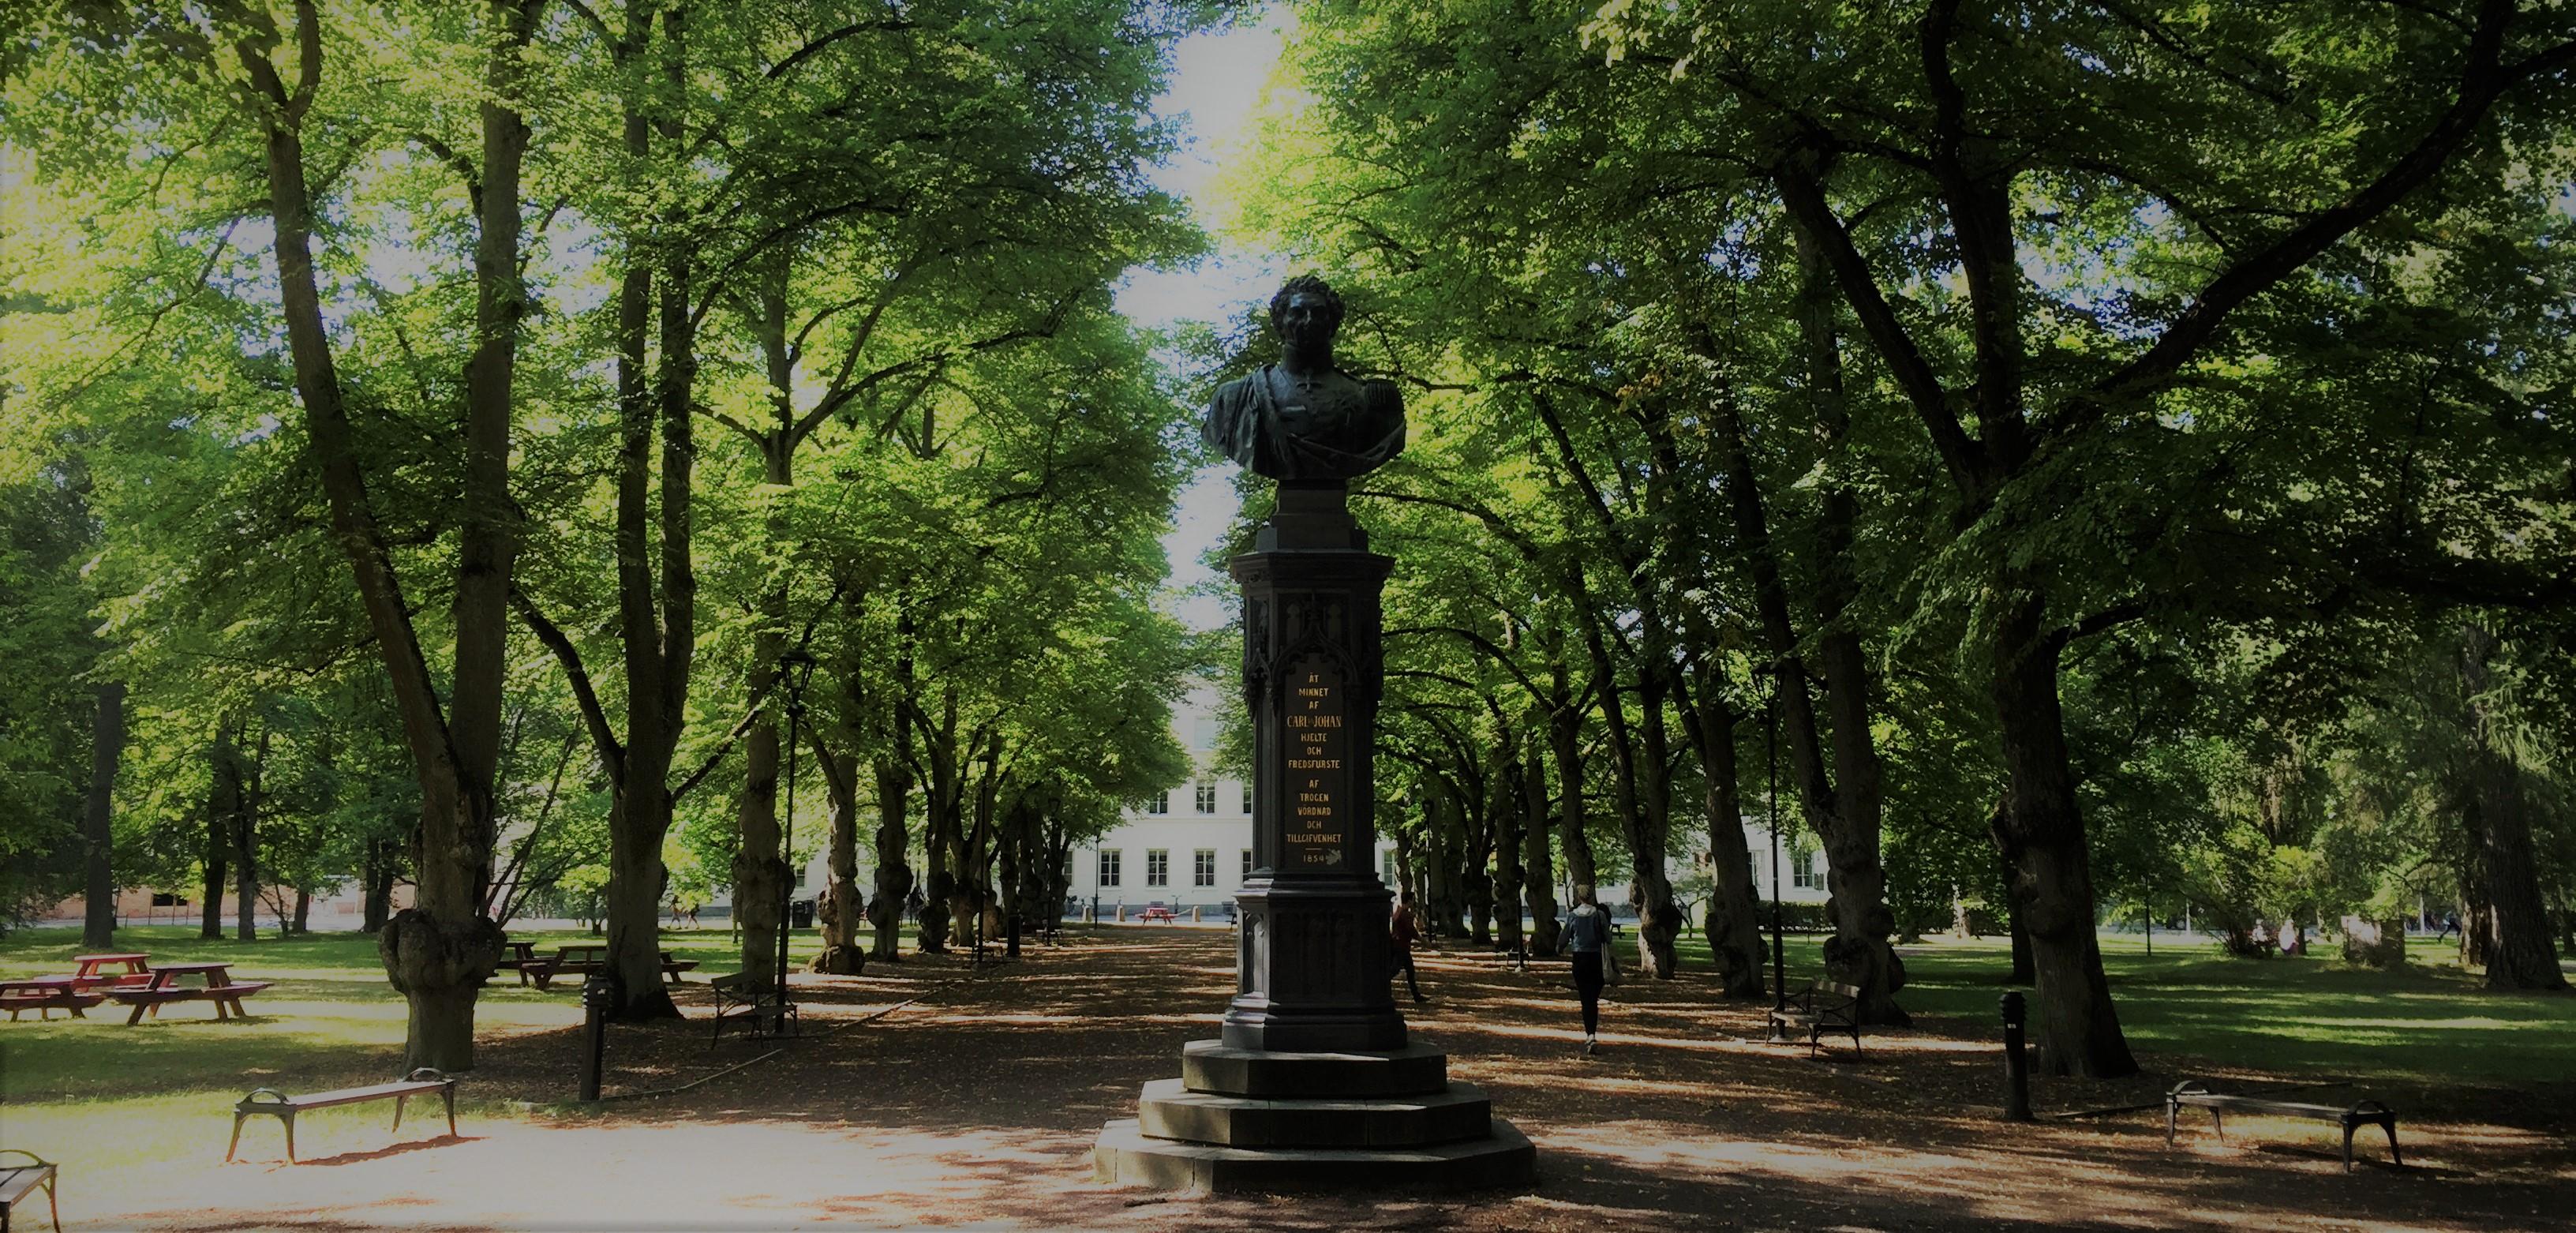 The university city, Uppsala!